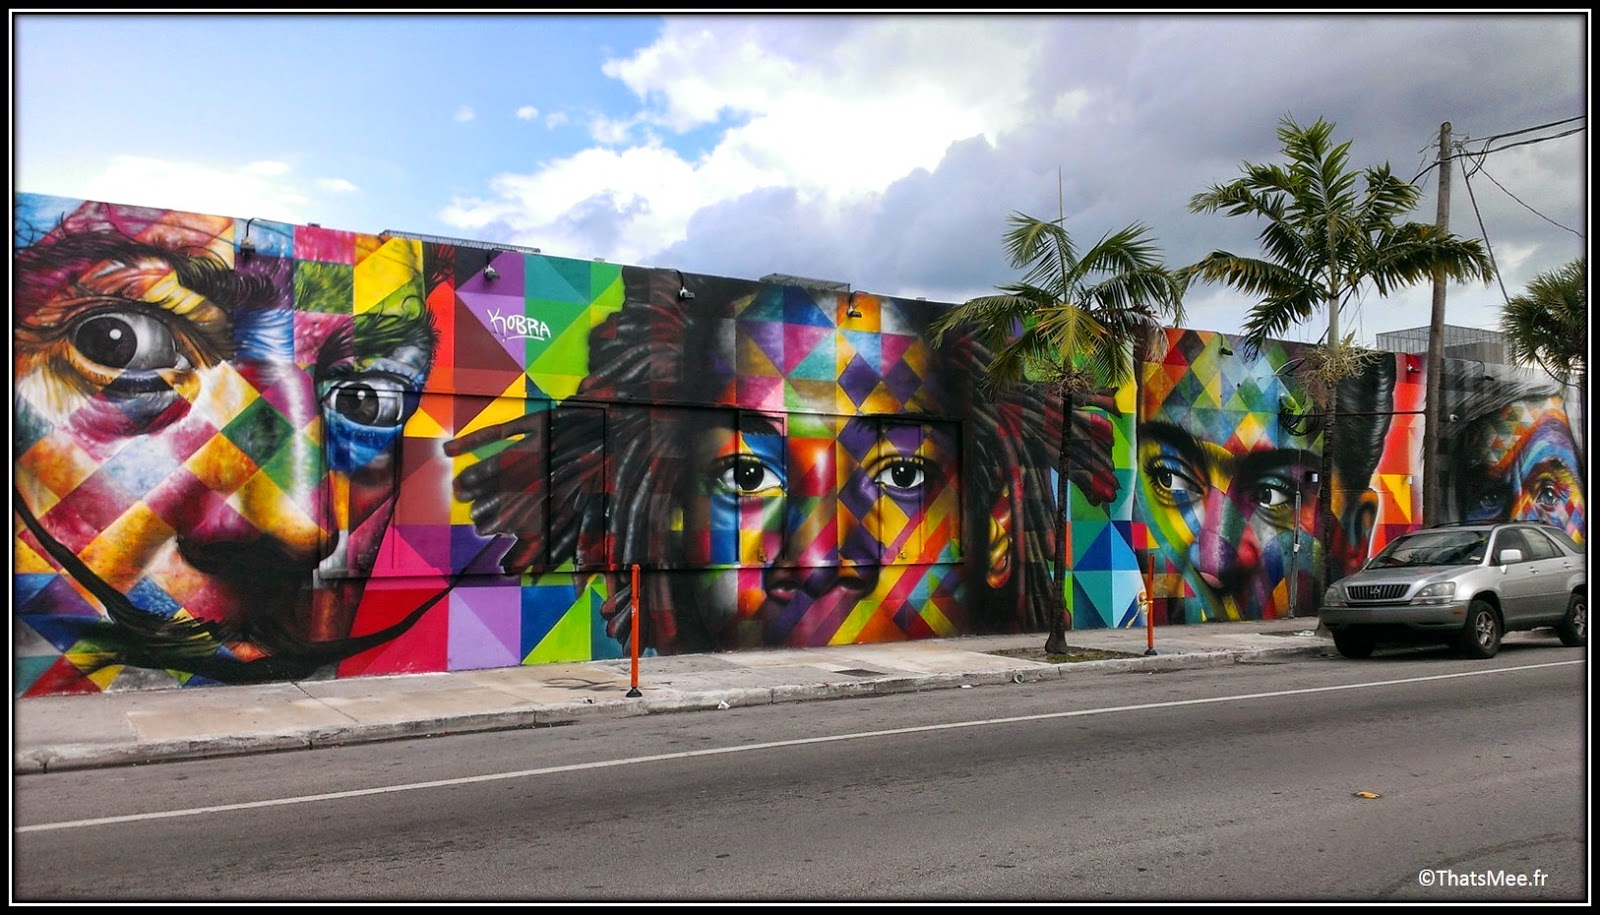 Dali, Basquiat, Warhol... Wynwood Art District, Miami